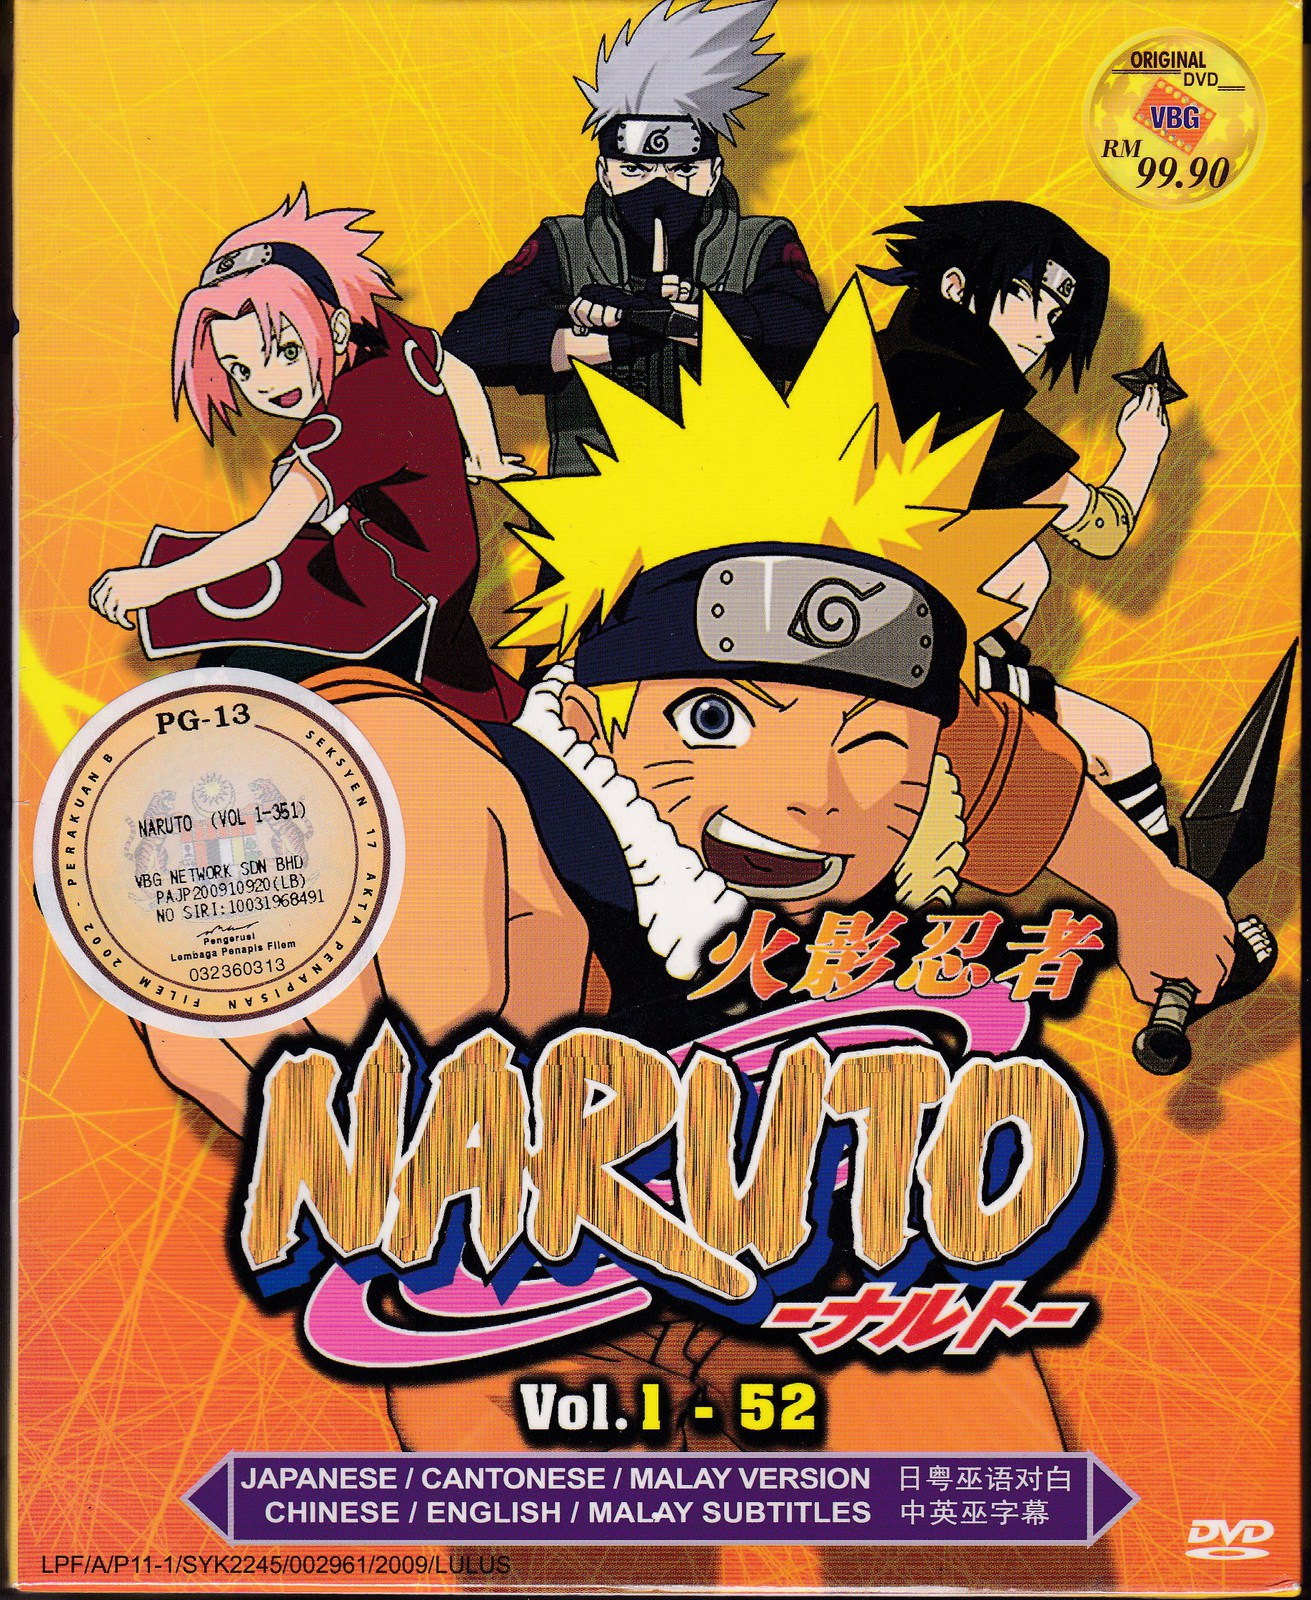 DVD ANIME NARUTO Season 1-2 Vol.1-52 Box Set 52 Episode